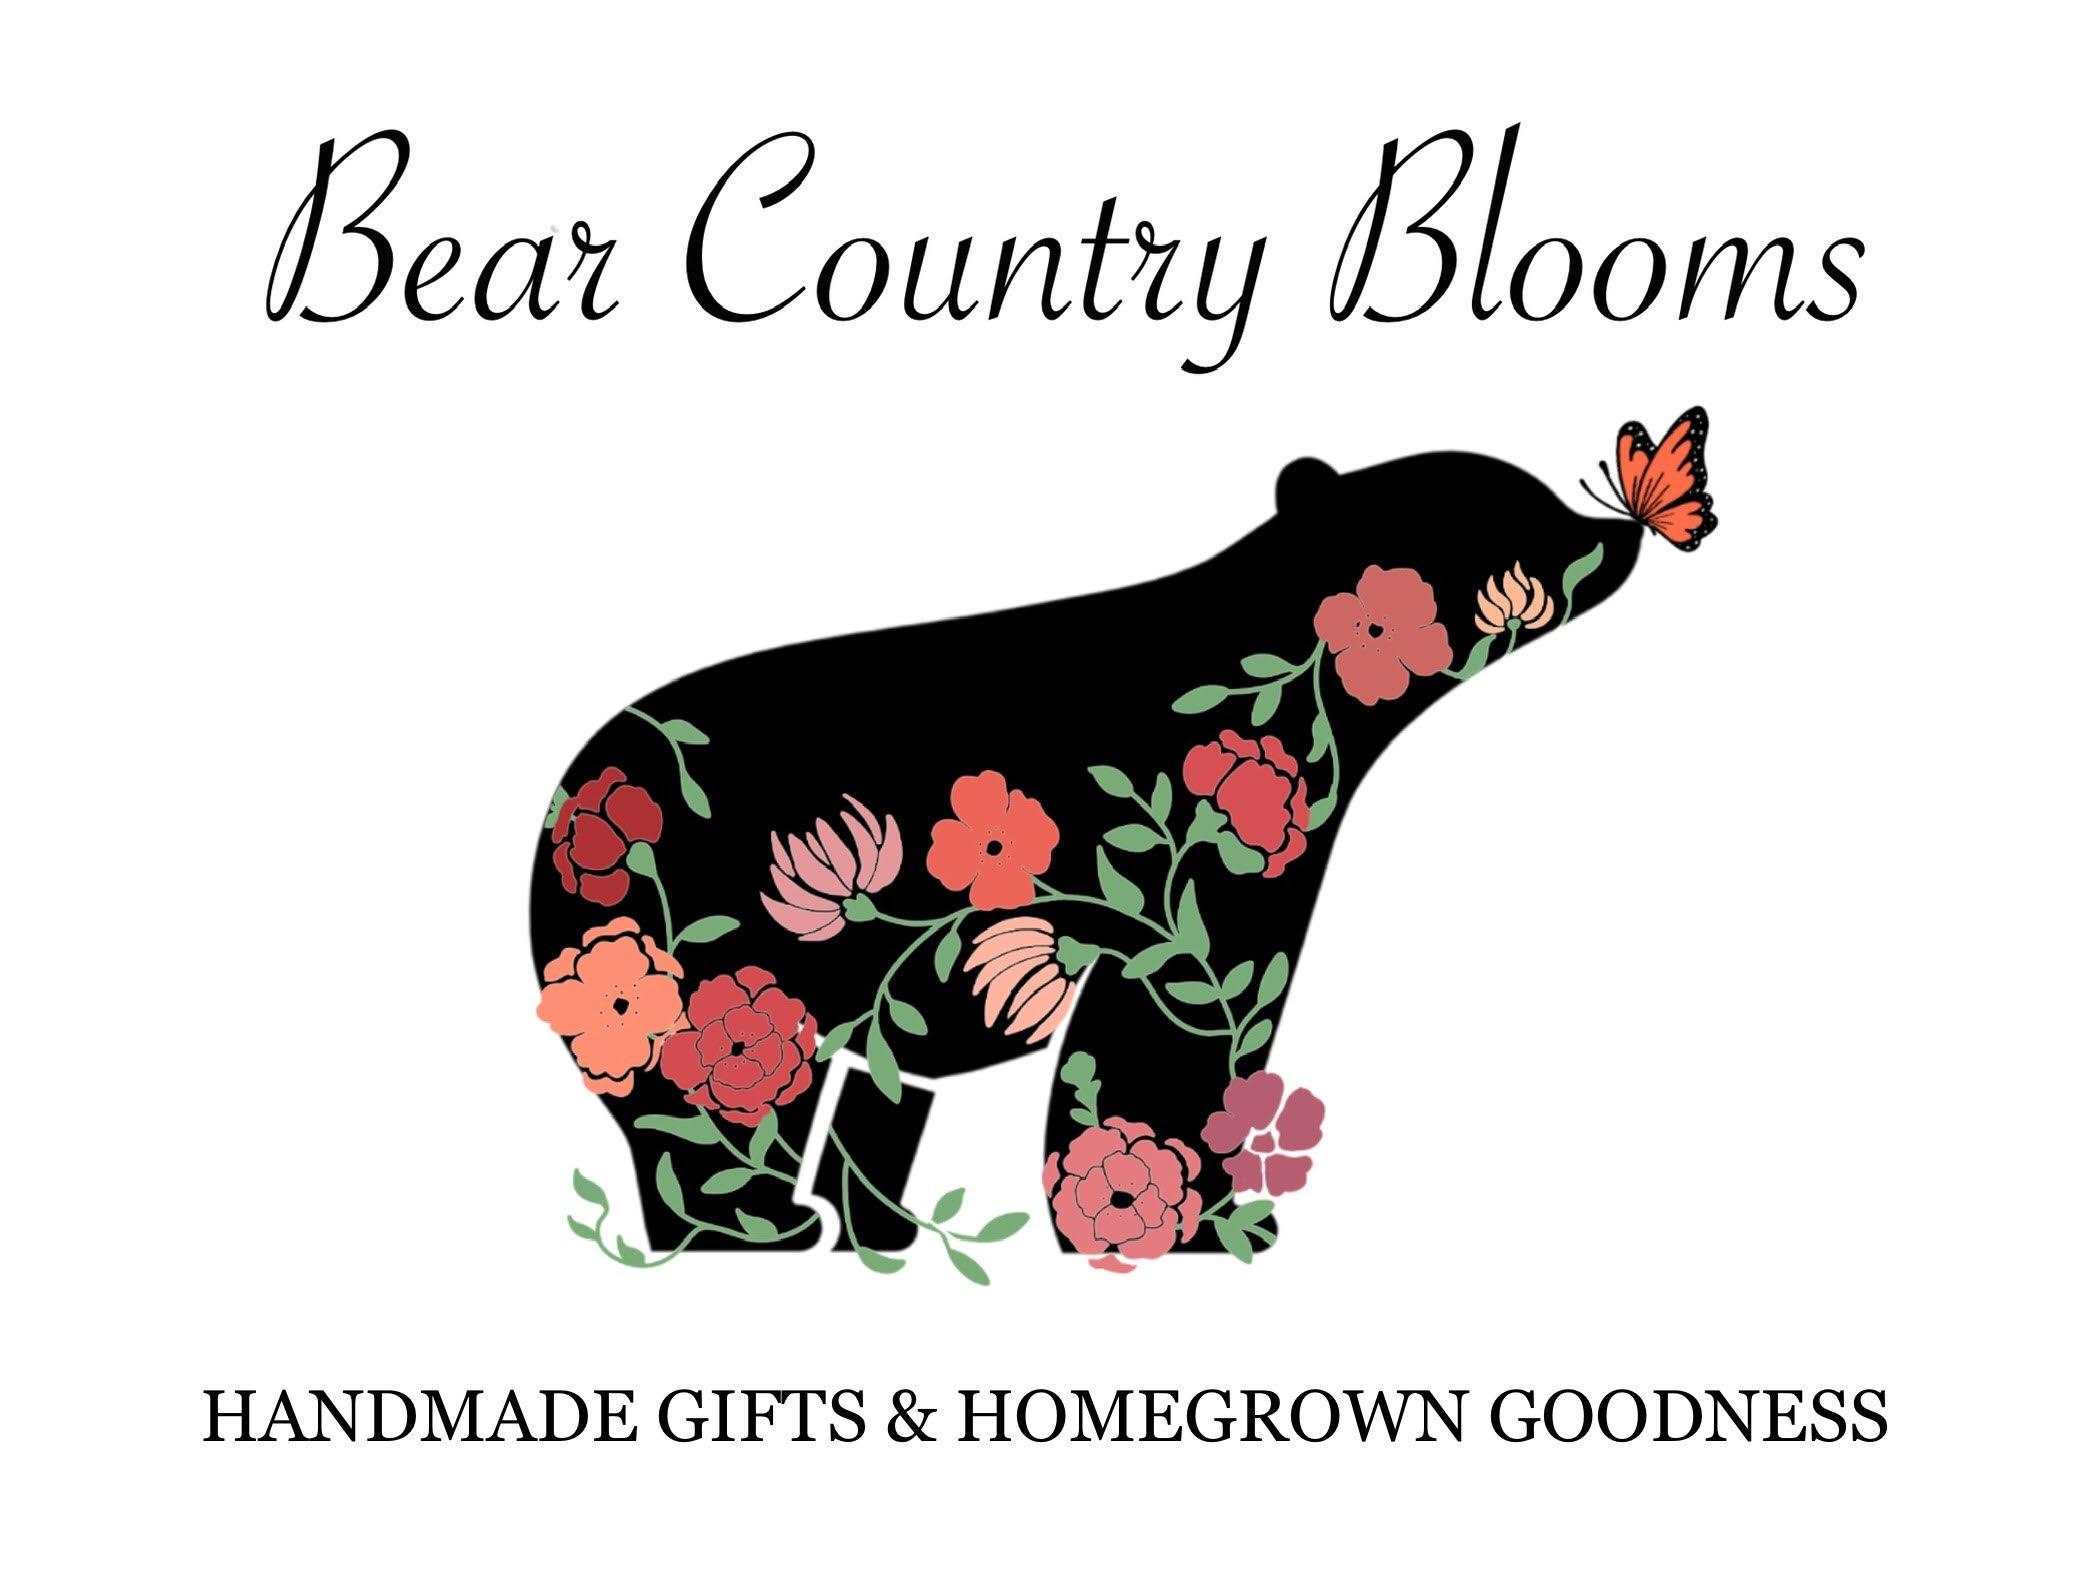 BearCountyBlooms